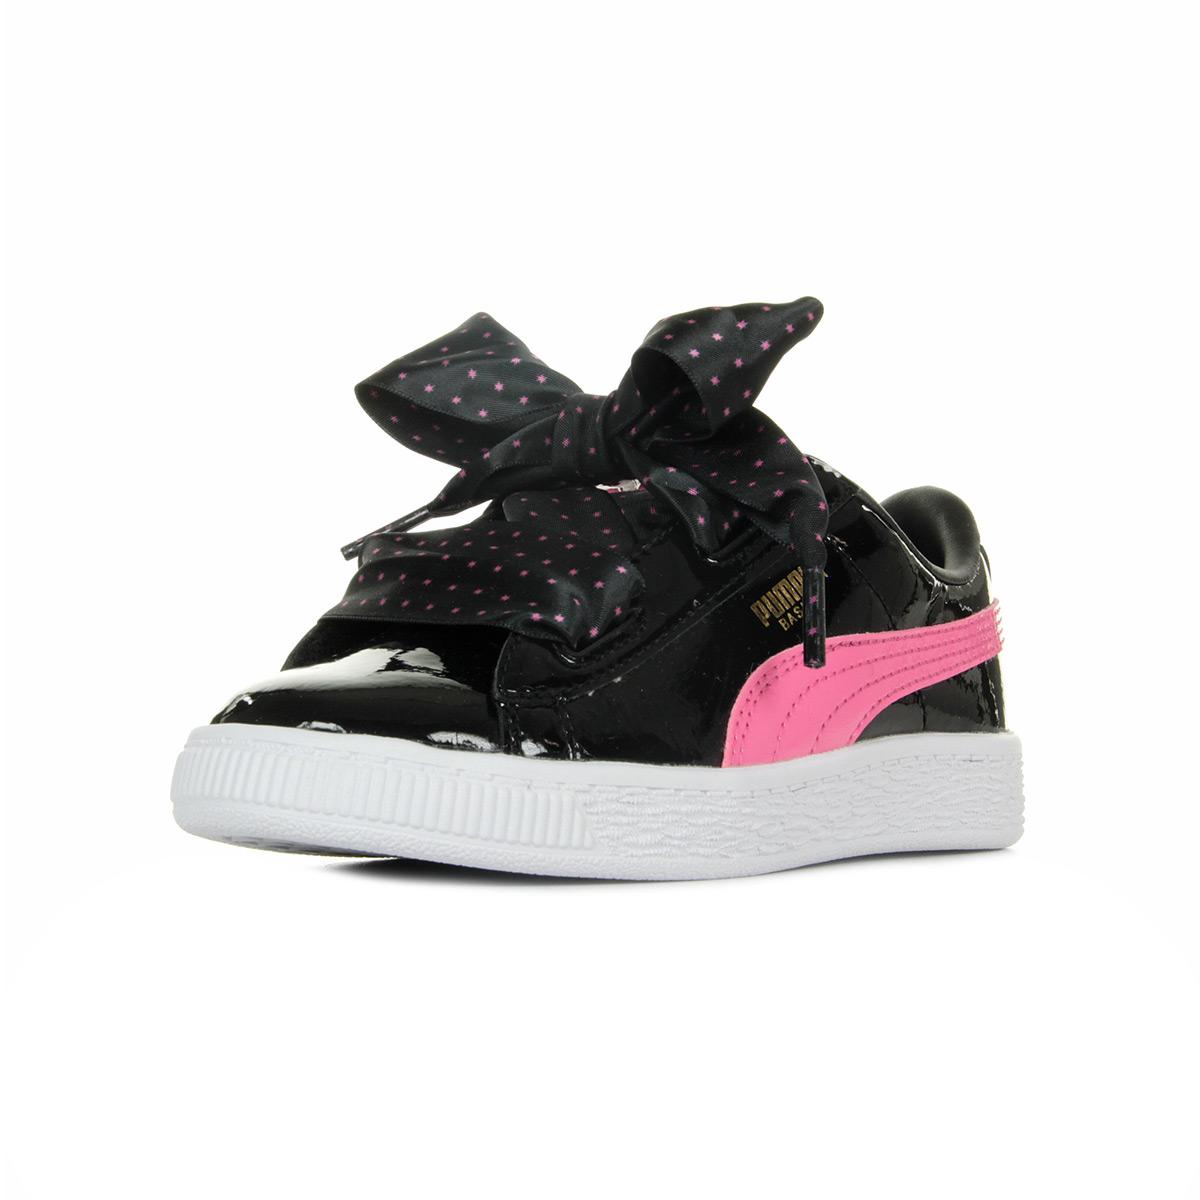 594252553faac Chaussures Baskets Puma fille Basket Heart Stars Ps taille Noir ...